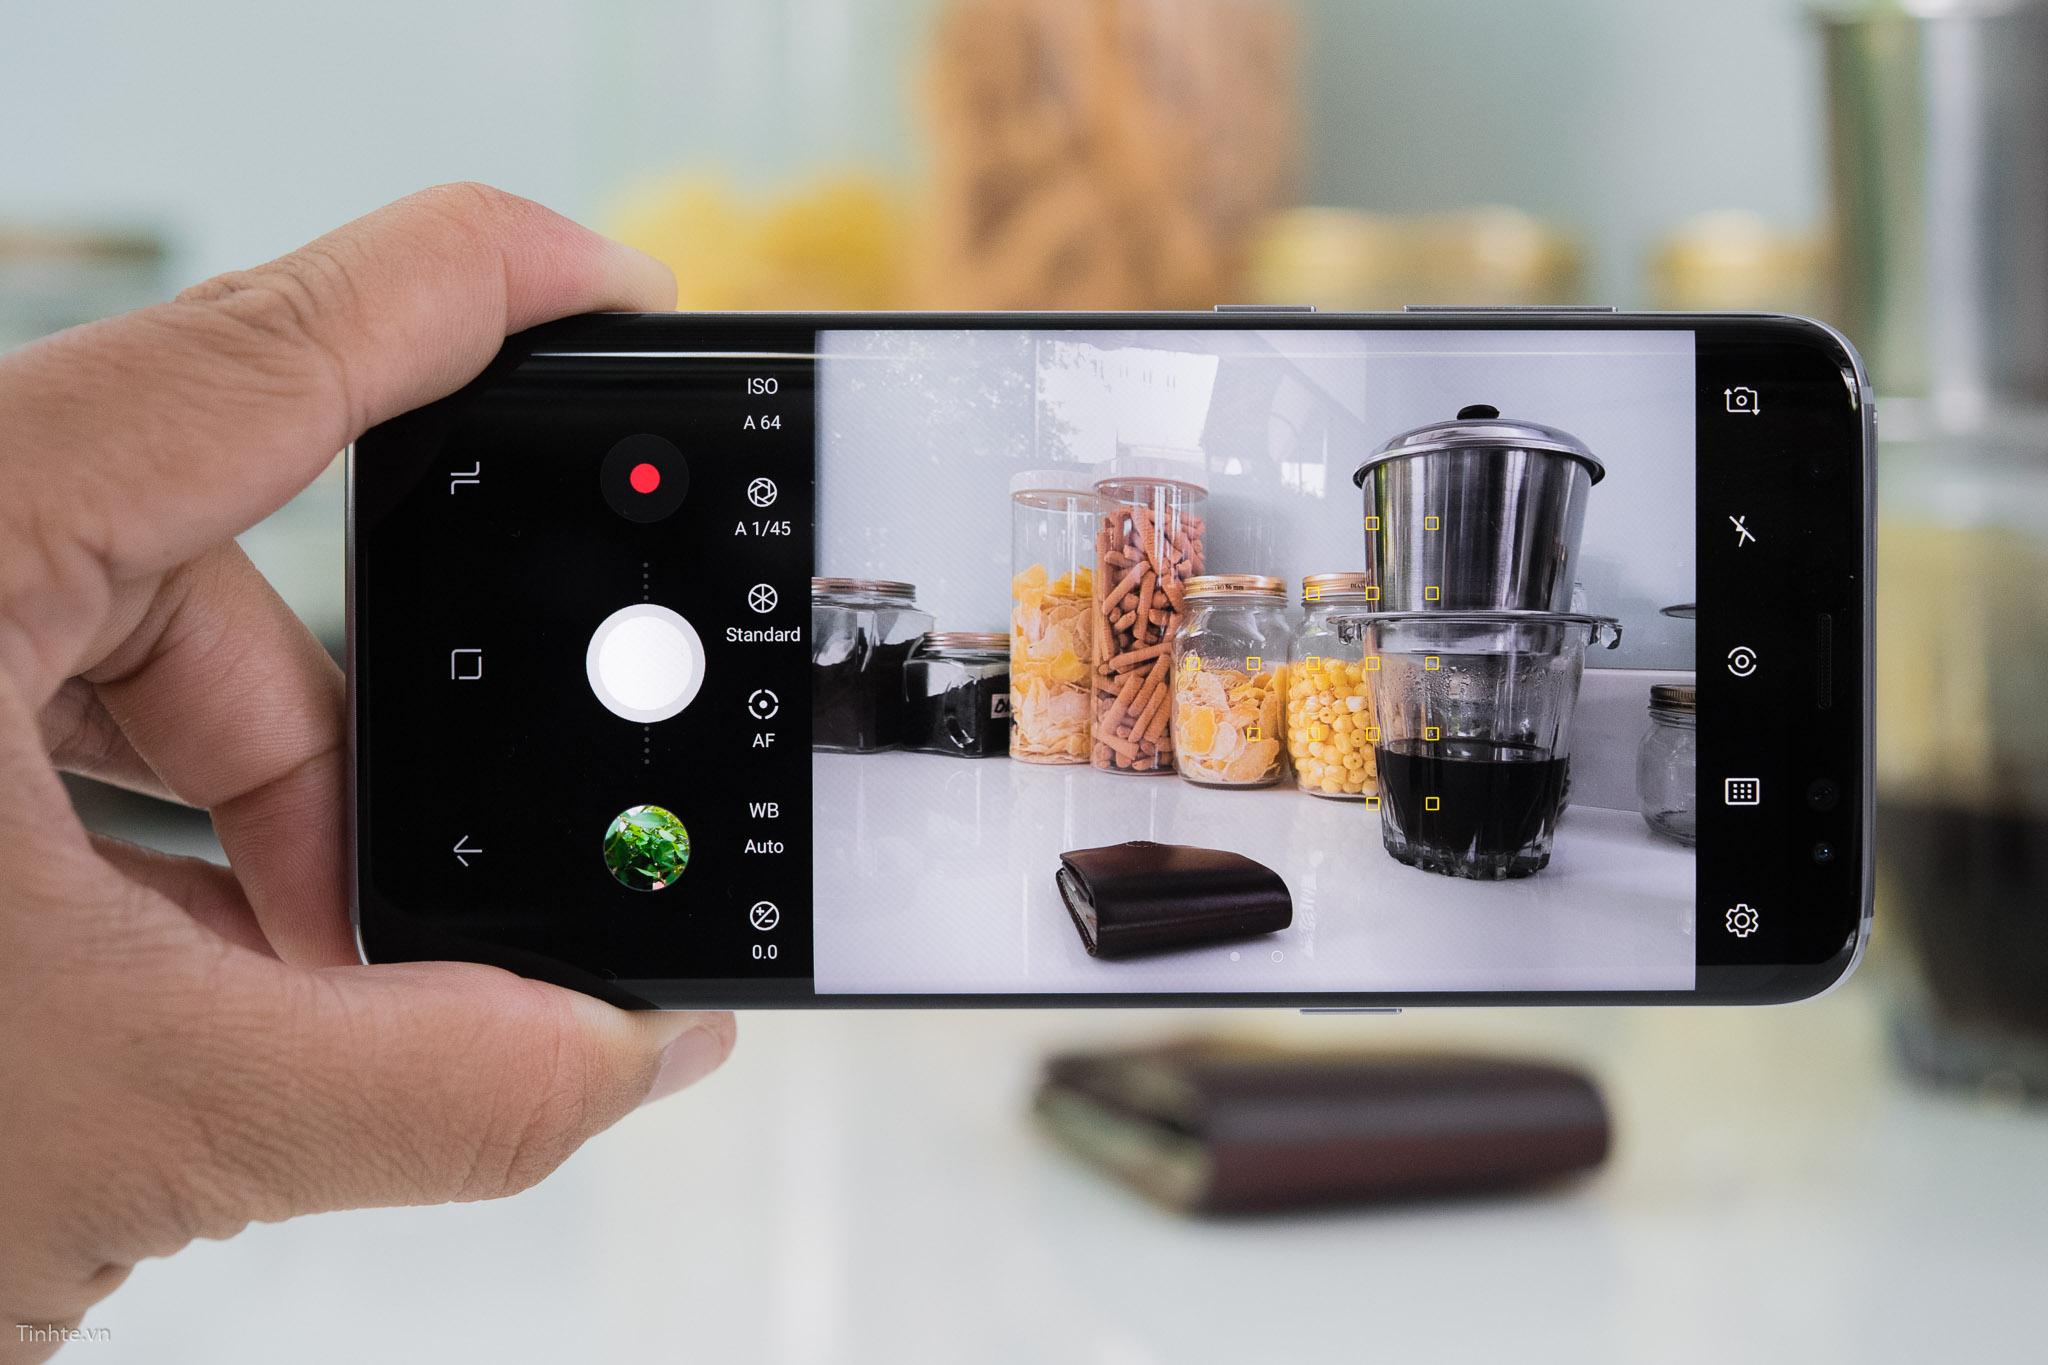 Camera_smartphone_second_hand.jpg